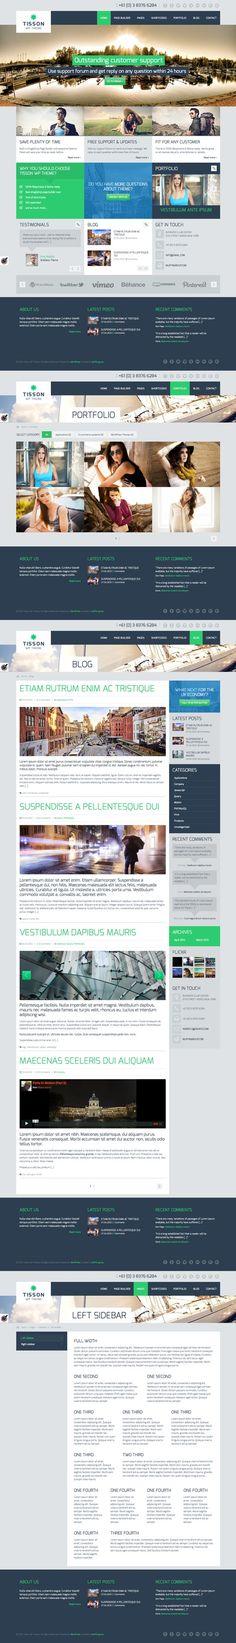 Muffingroup Tisson theme #flat #design #website #wordpress